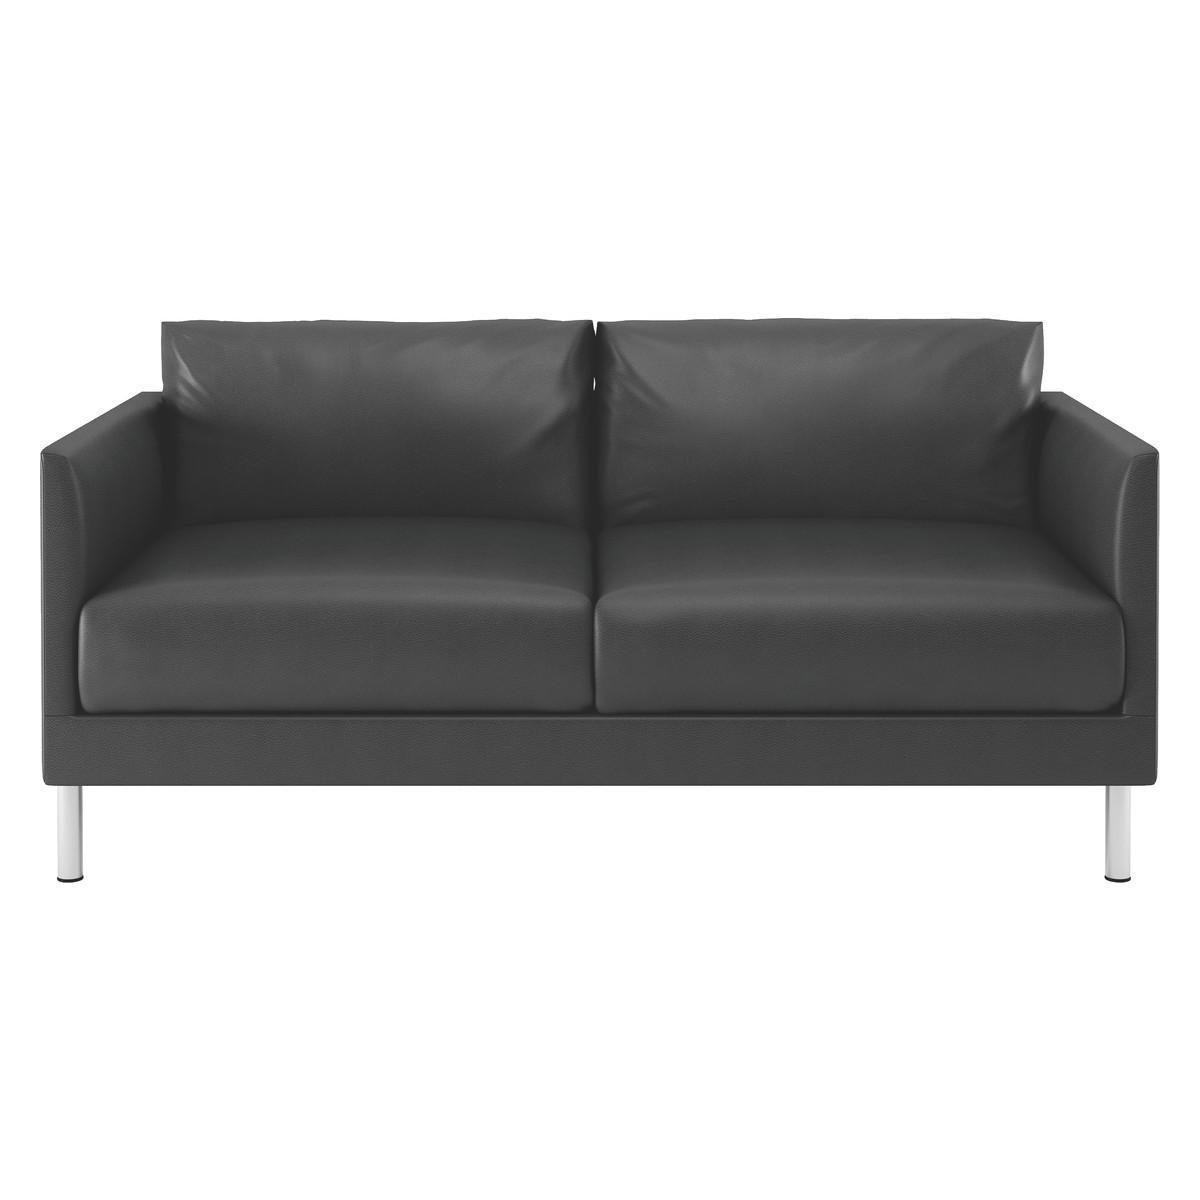 20 Best Ideas Black 2 Seater Sofas Sofa Ideas